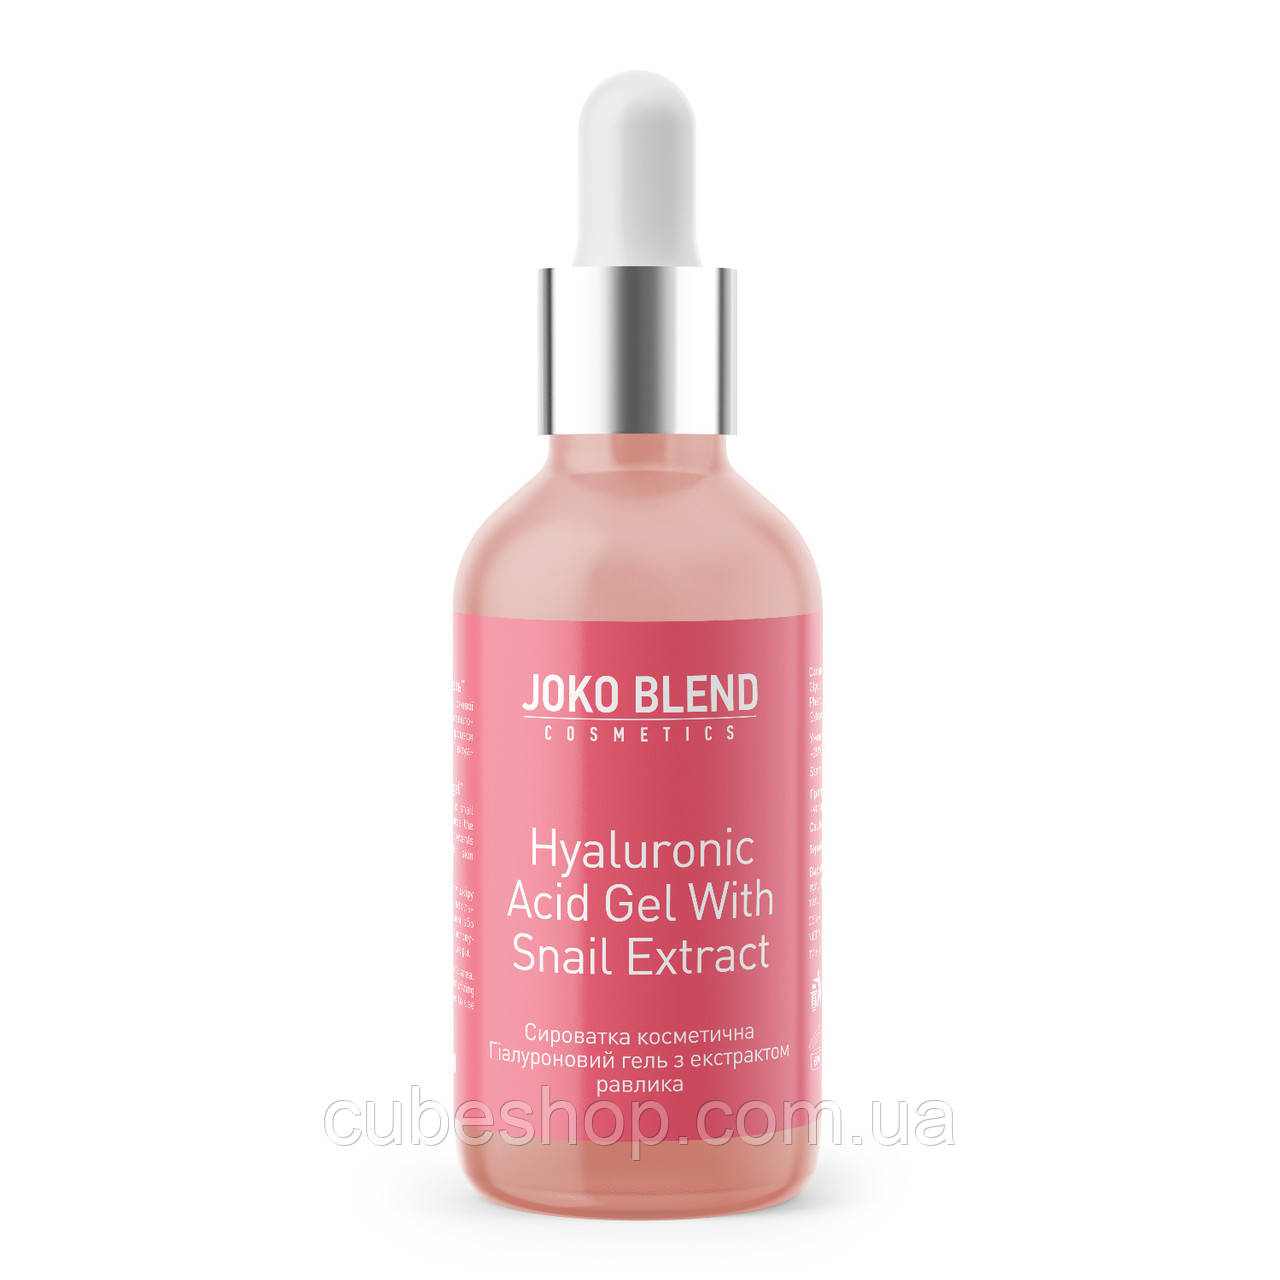 Сыворотка-гель для лица Hyaluronic Acid Gel With Snail Extract Joko Blend, 30 мл